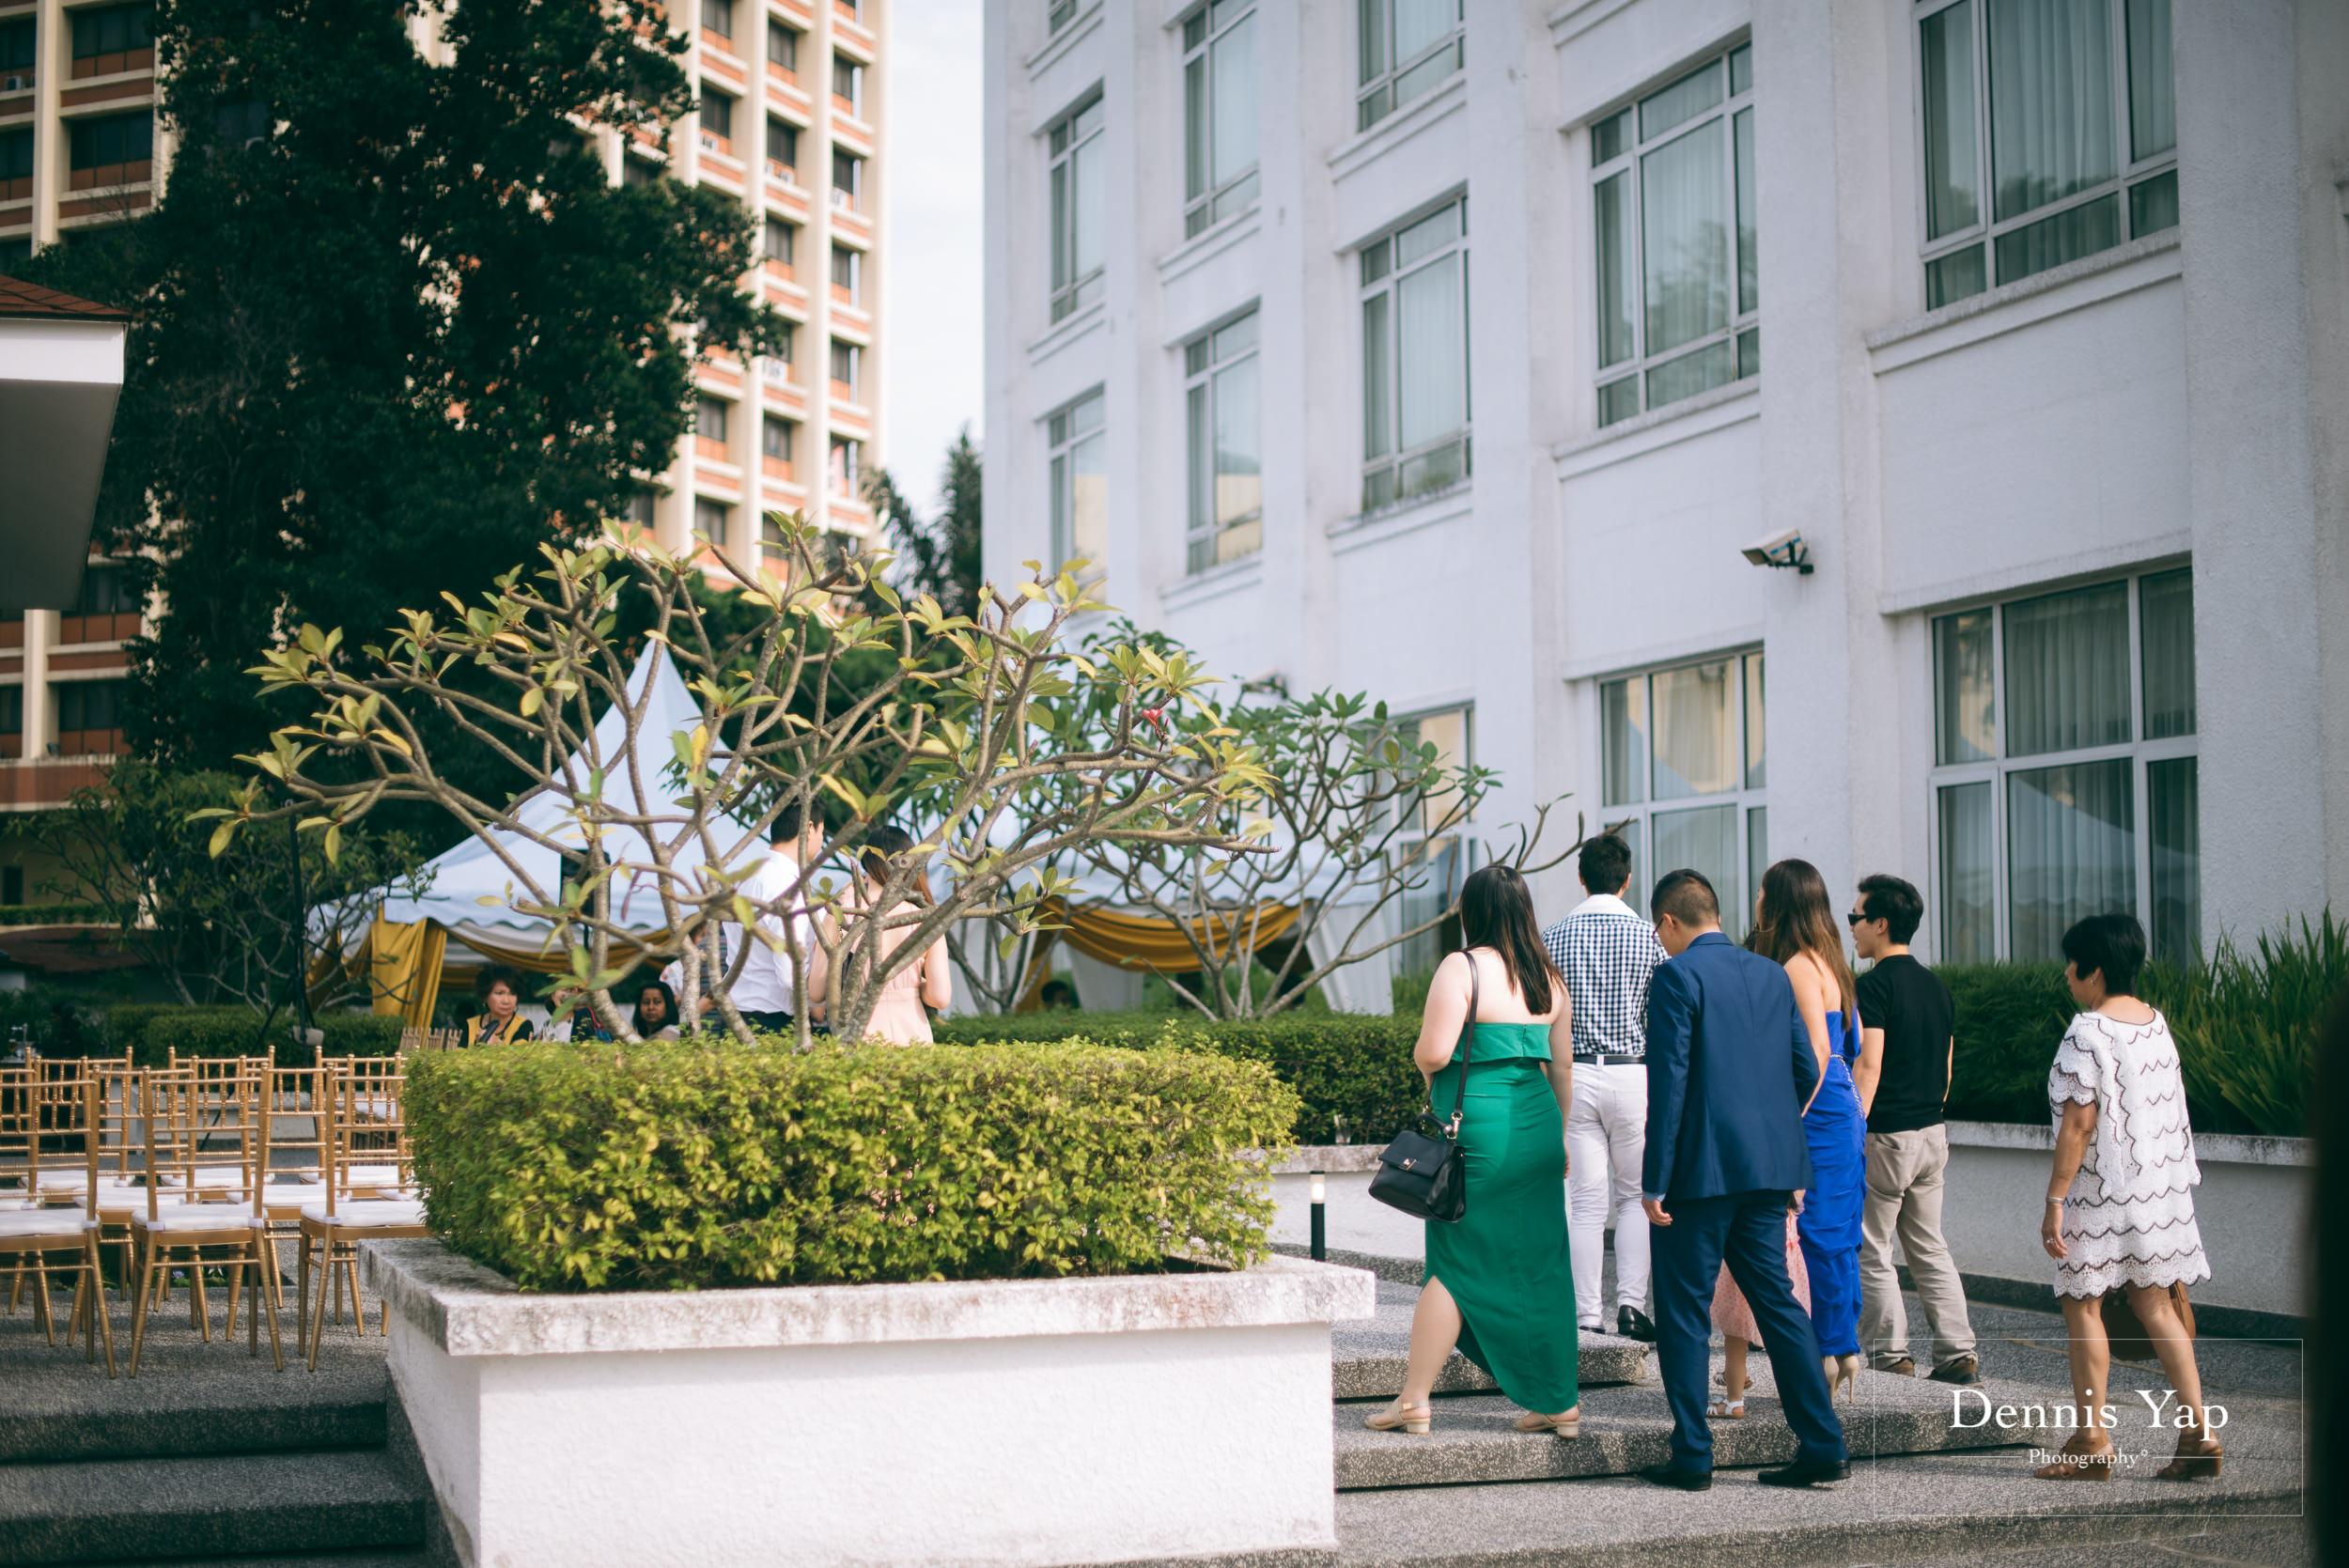 lionel joanne garden wedding majestic hotel dennis yap photography malaysia top wedding photographer-15.jpg